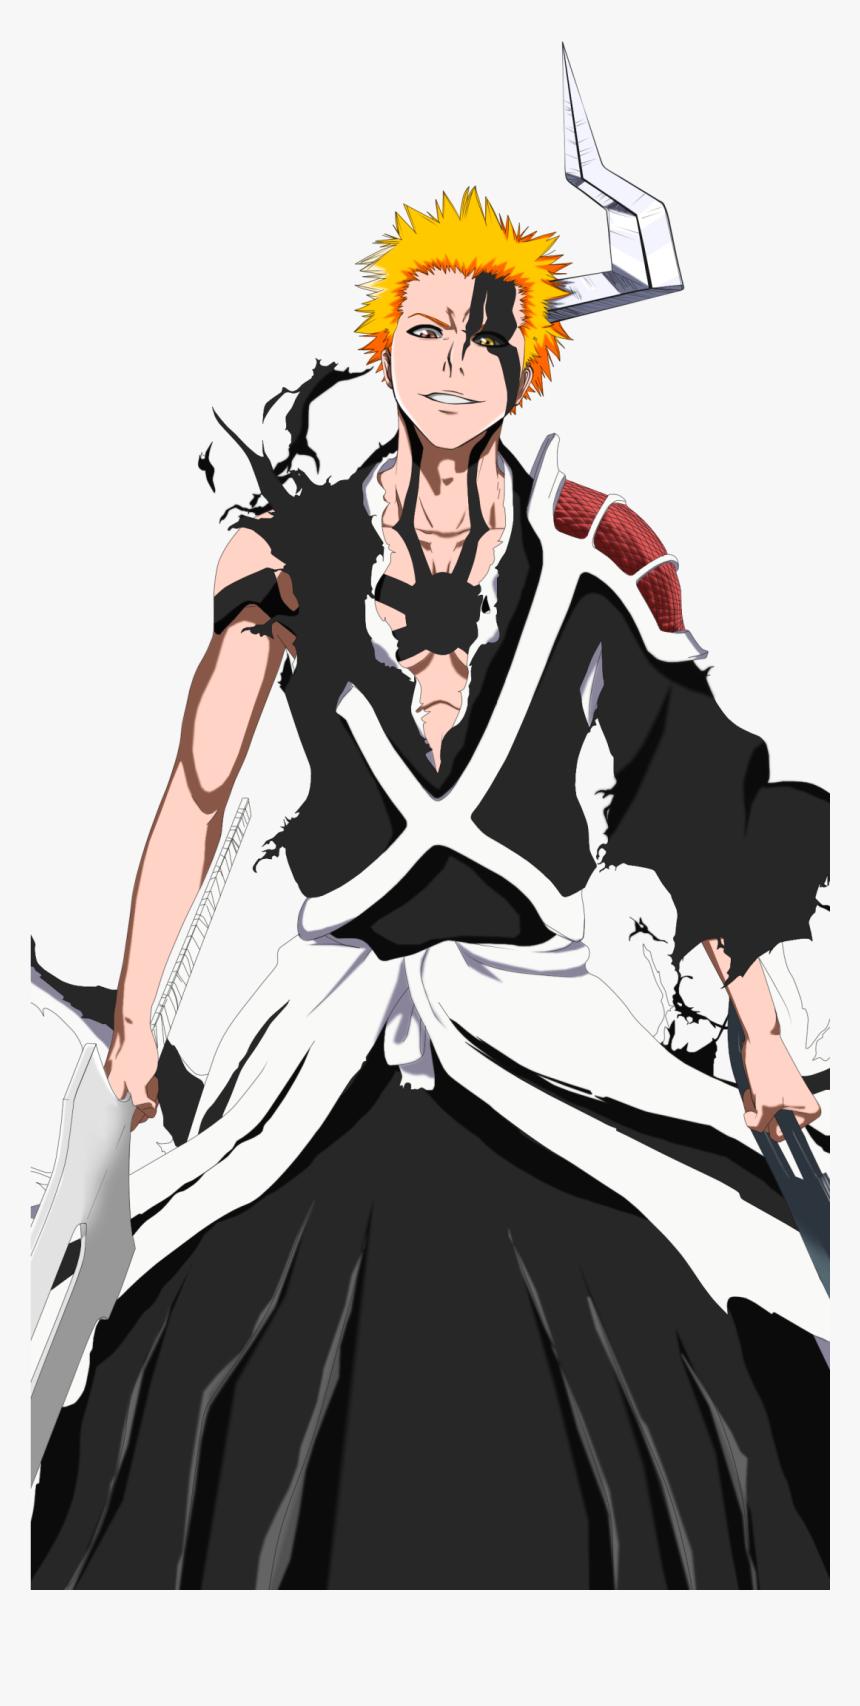 Transparent Bleach Anime Png Ichigo 1000 Year Blood War Png Download Kindpng